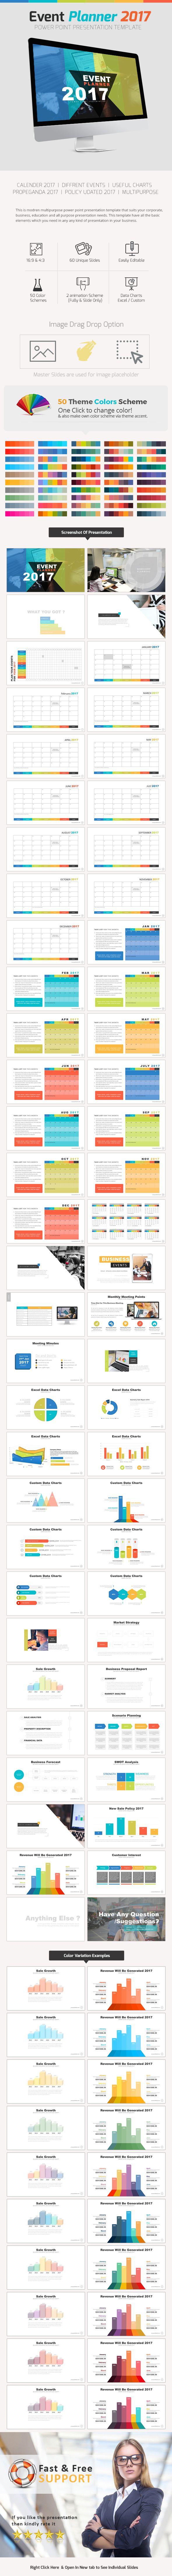 event planner 2017 presentation | powerpoint presentation, Presentation templates